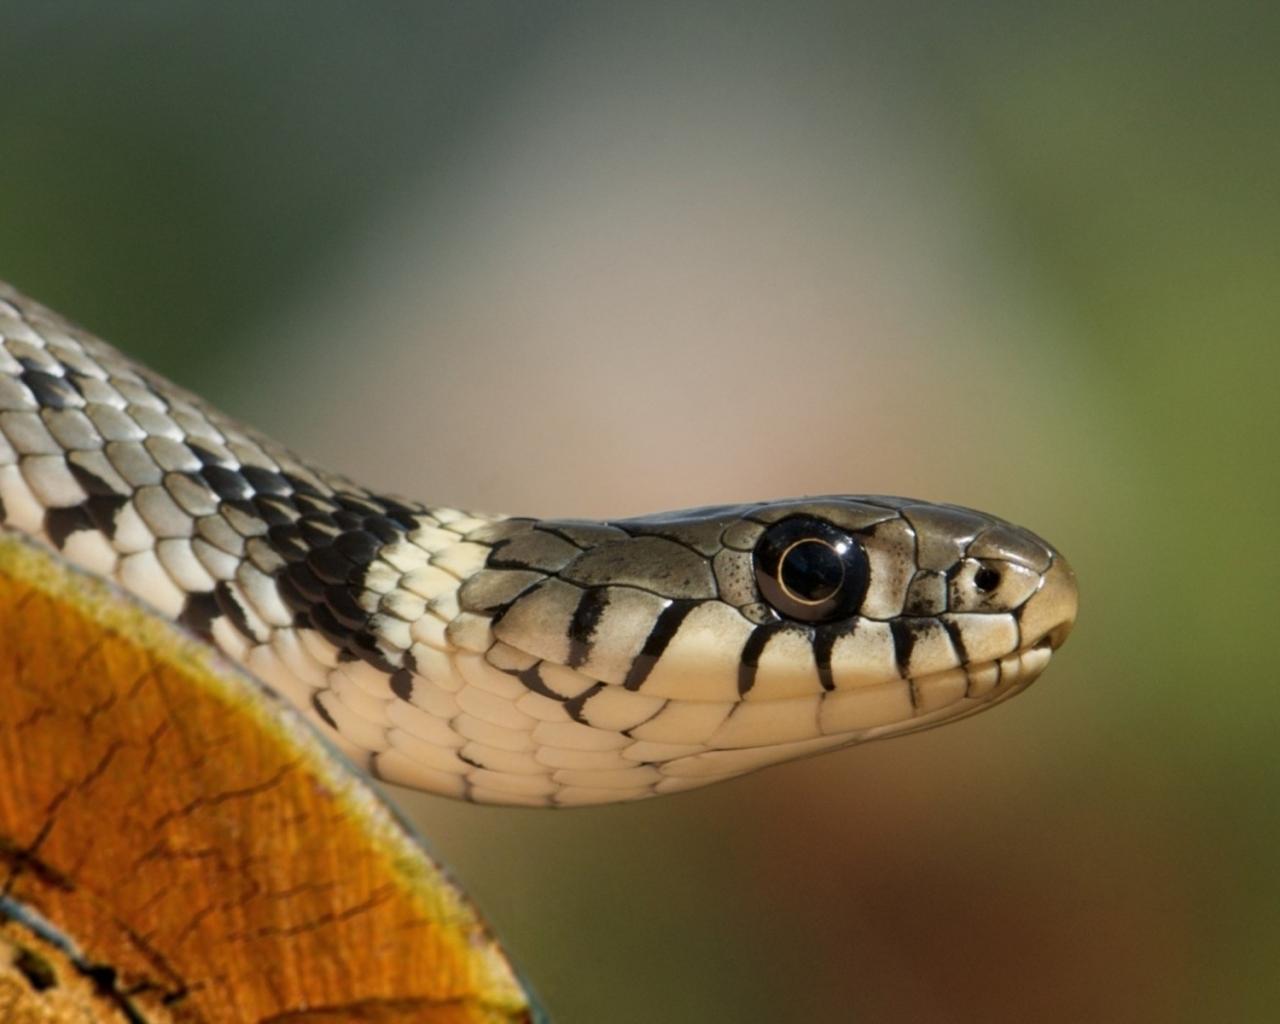 Una cobra - 1280x1024